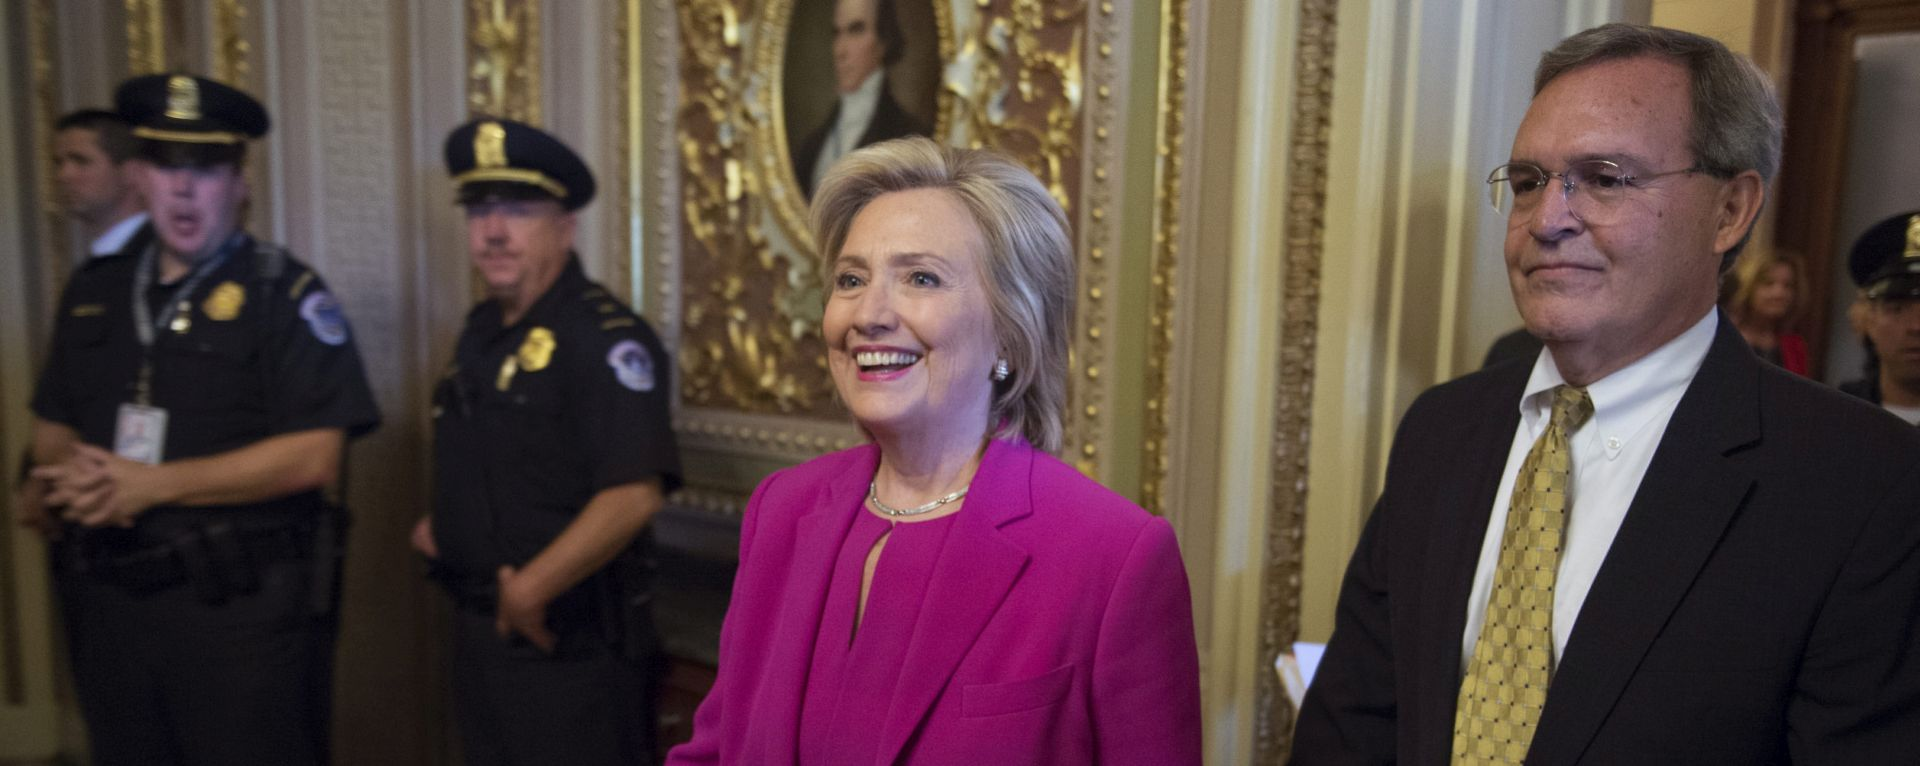 PREDIZBORNA PODMETANJA? Podnesen zahtjev za istragu o elektroničkoj pošti Hillary Clinton